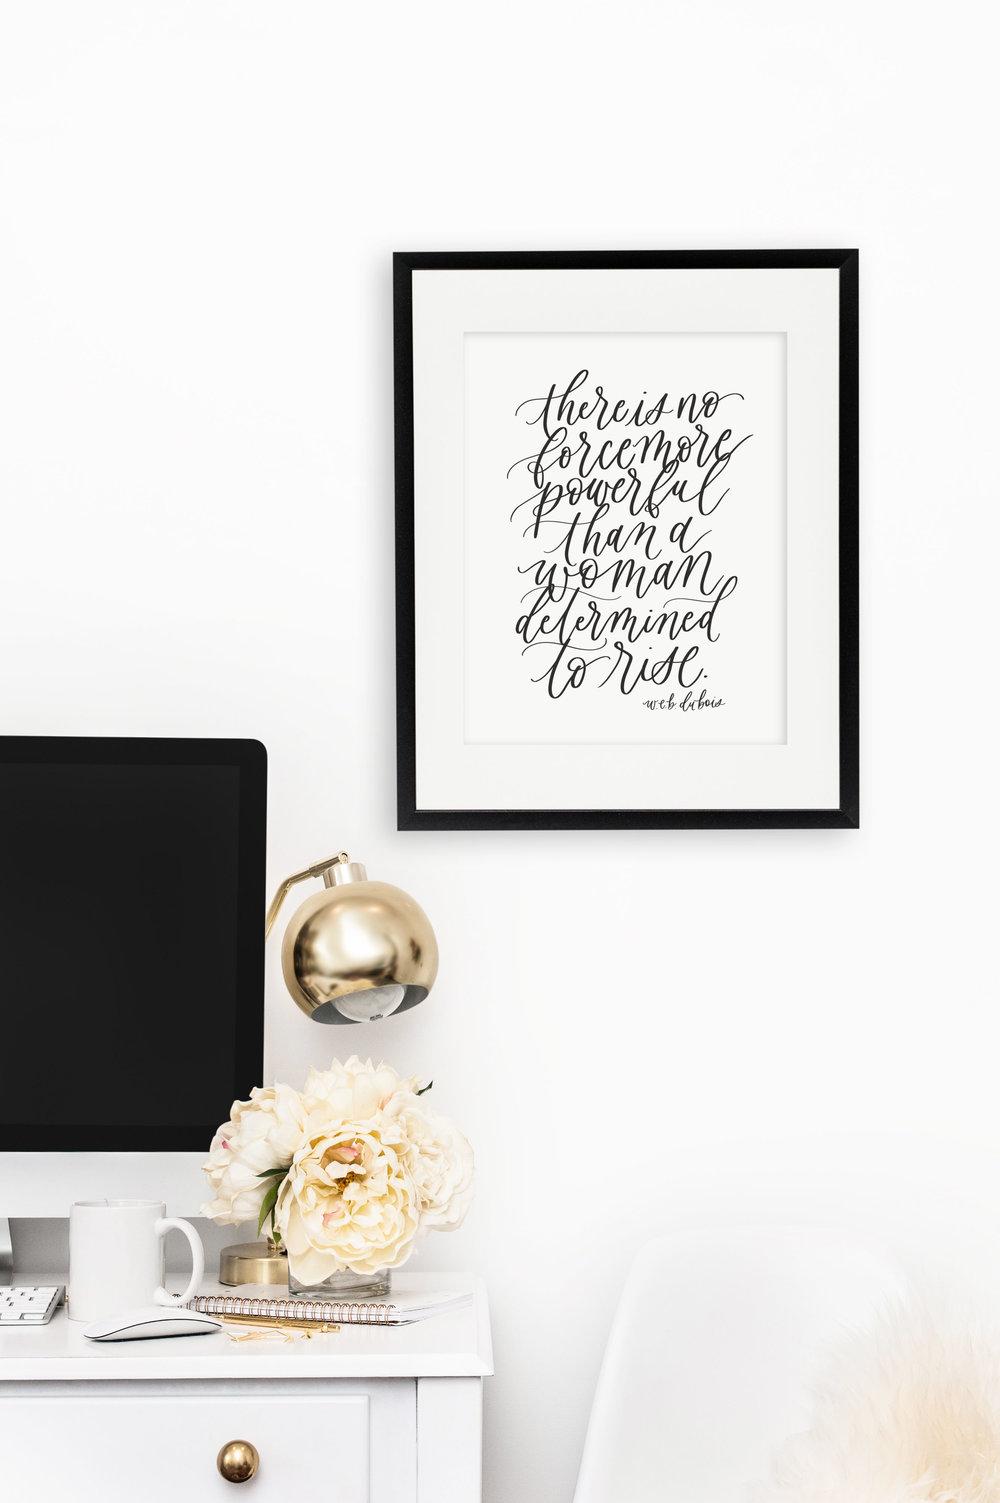 Jennifer Bianca Calligraphy - Prints + Cards at jenniferbianca.com